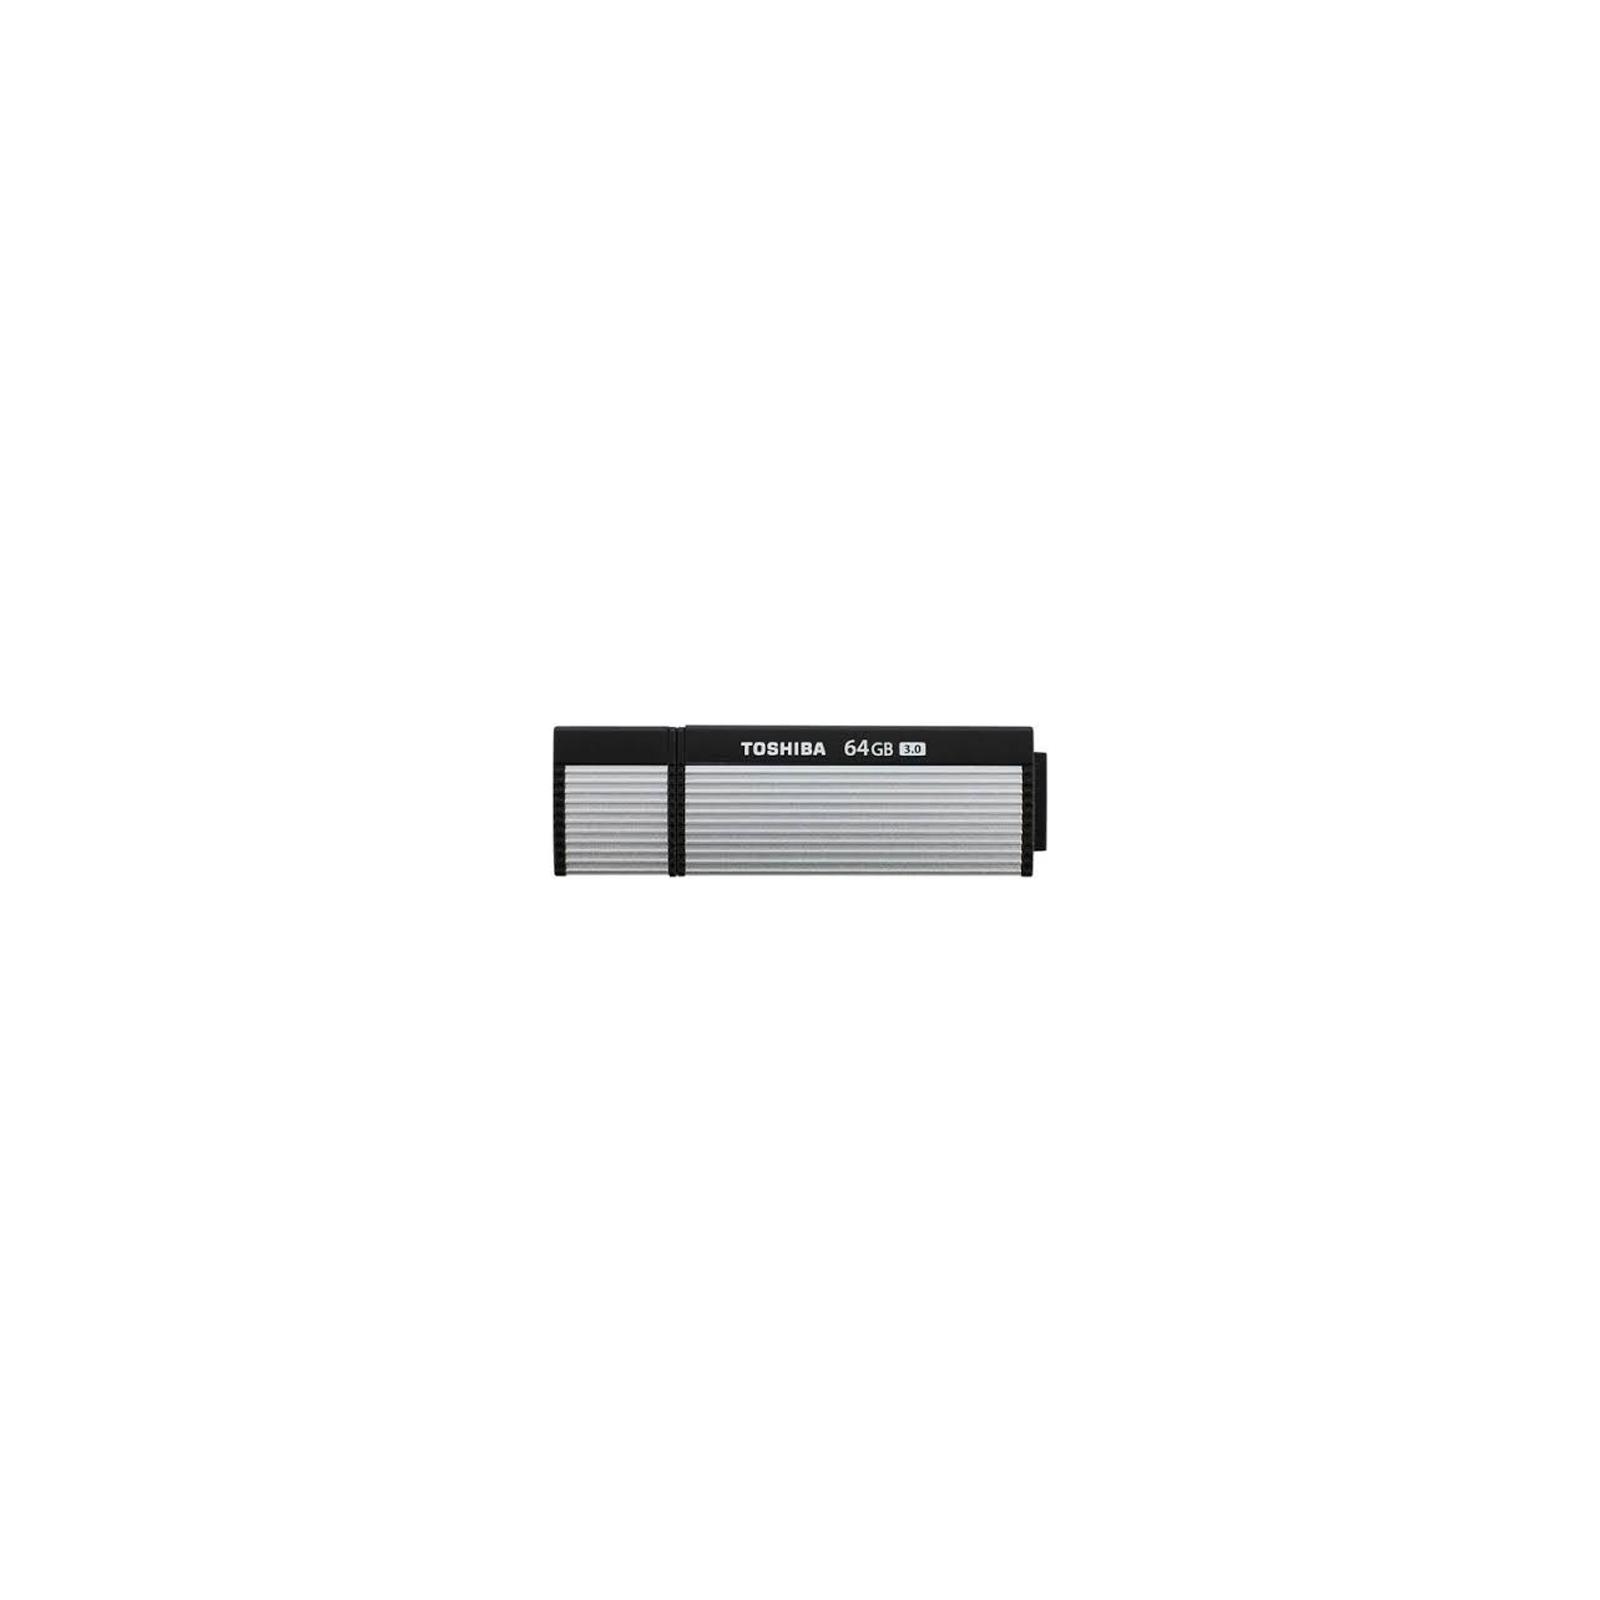 USB флеш накопитель 64GB USB 3.0 TOSHIBA (THNV64OSU3 BL7)